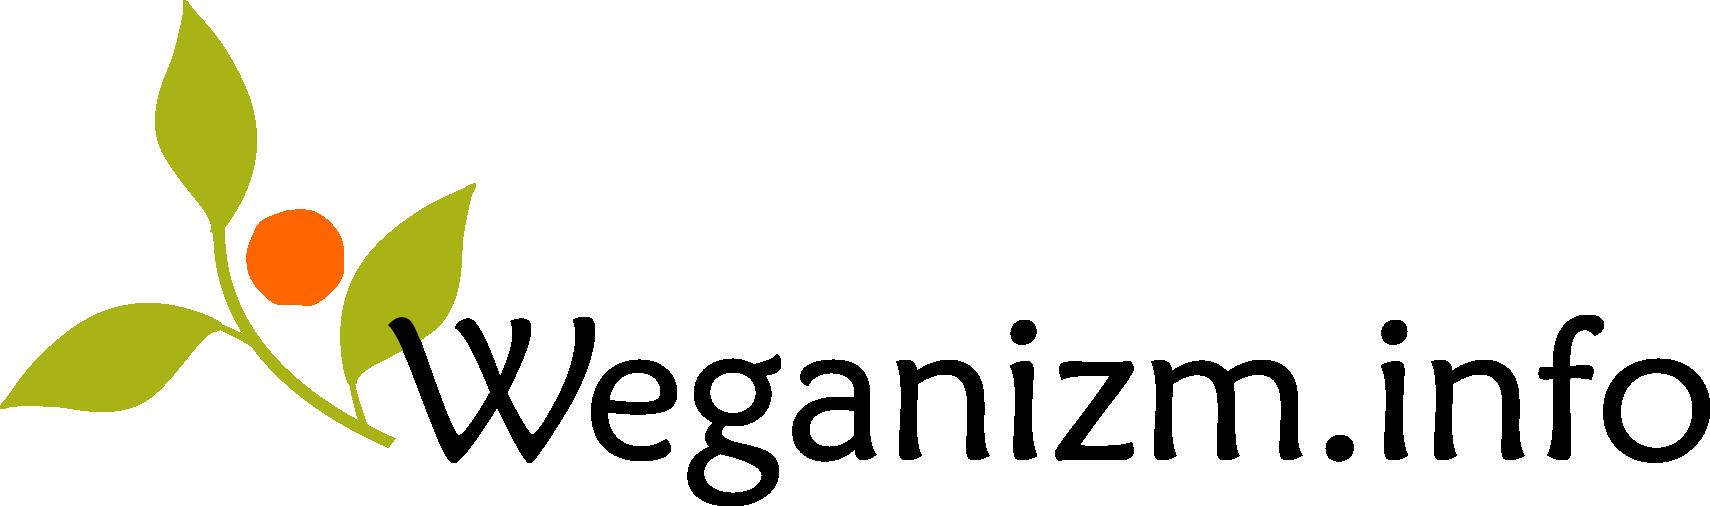 Weganizm.info logo